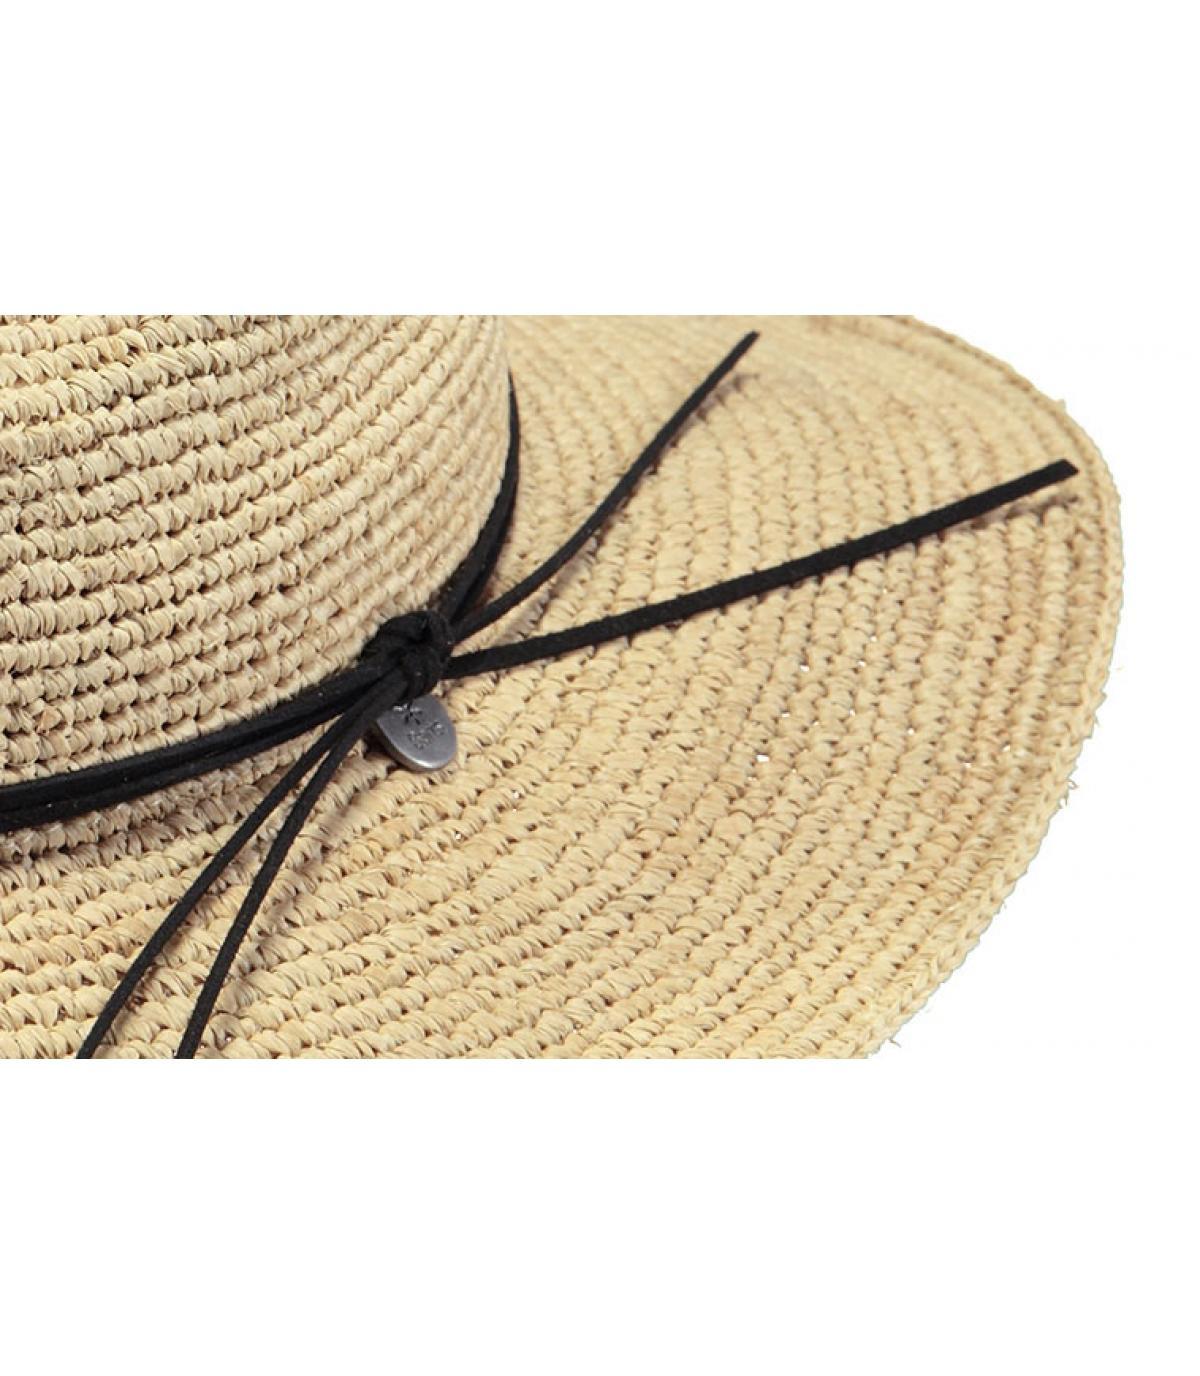 cf624a614 Celery Hat natural